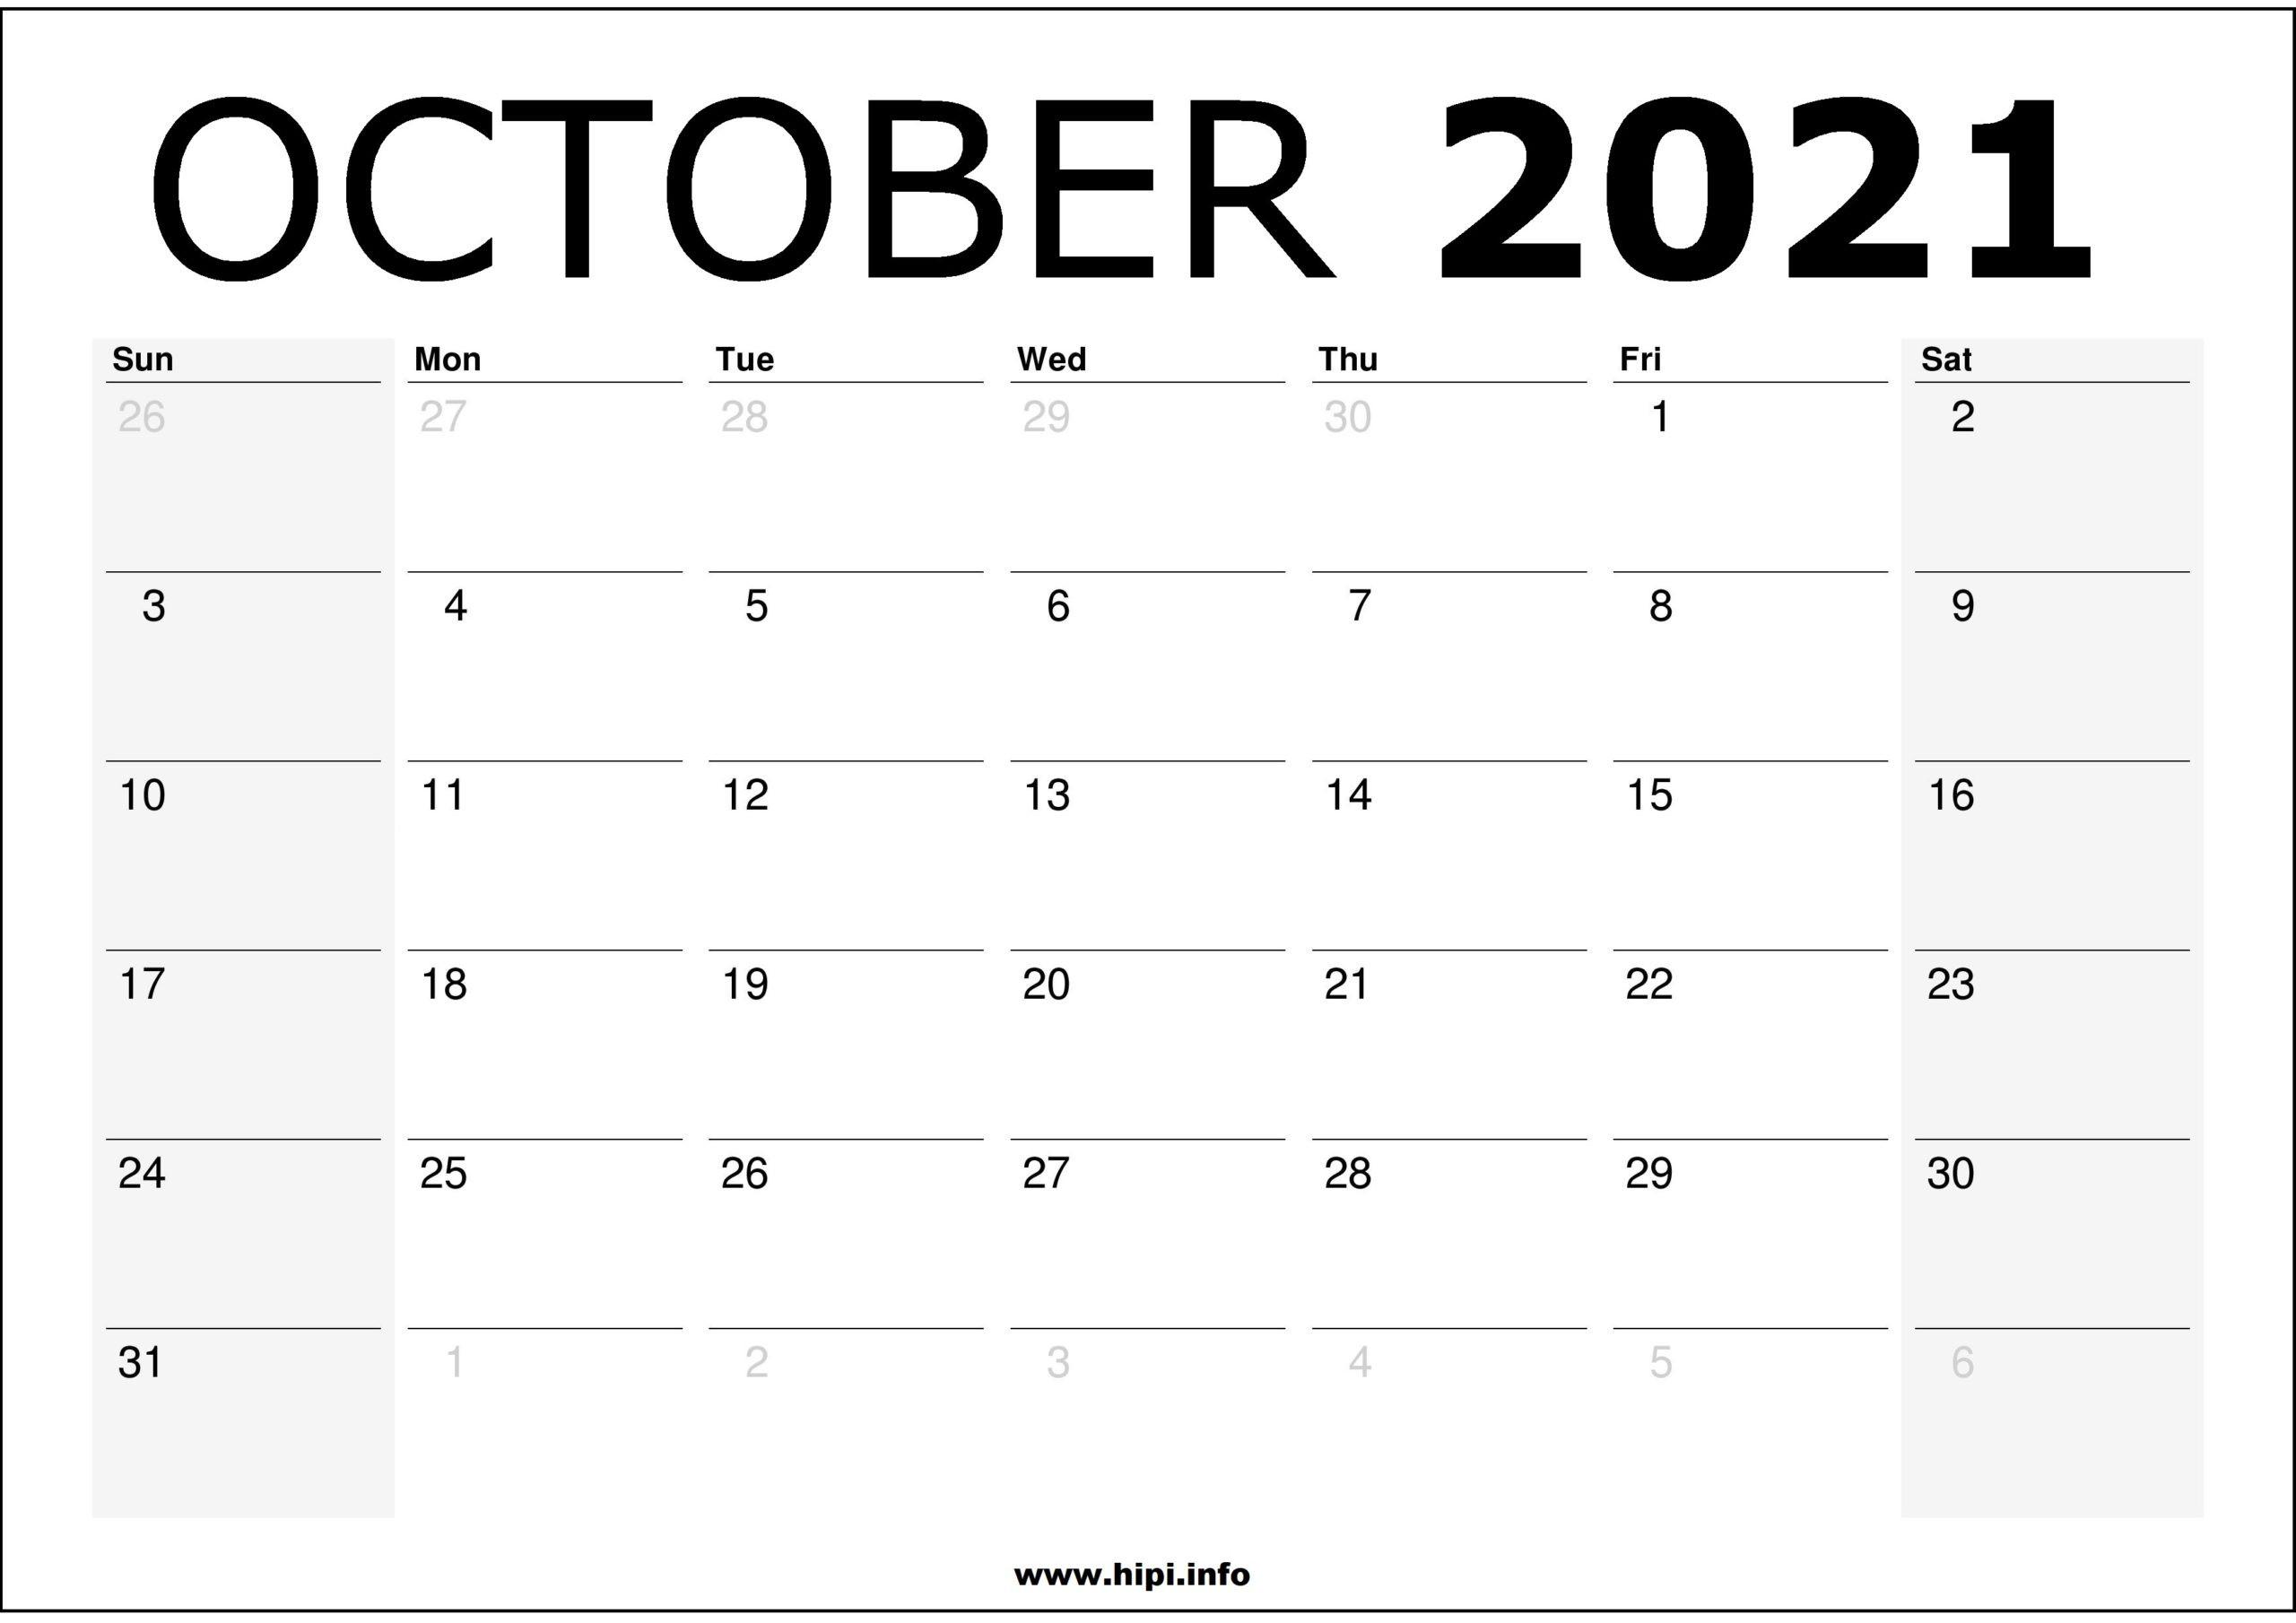 October 2021 Calendar Printable - Monthly Calendar Free-Monthly Schedule Planner August 2021